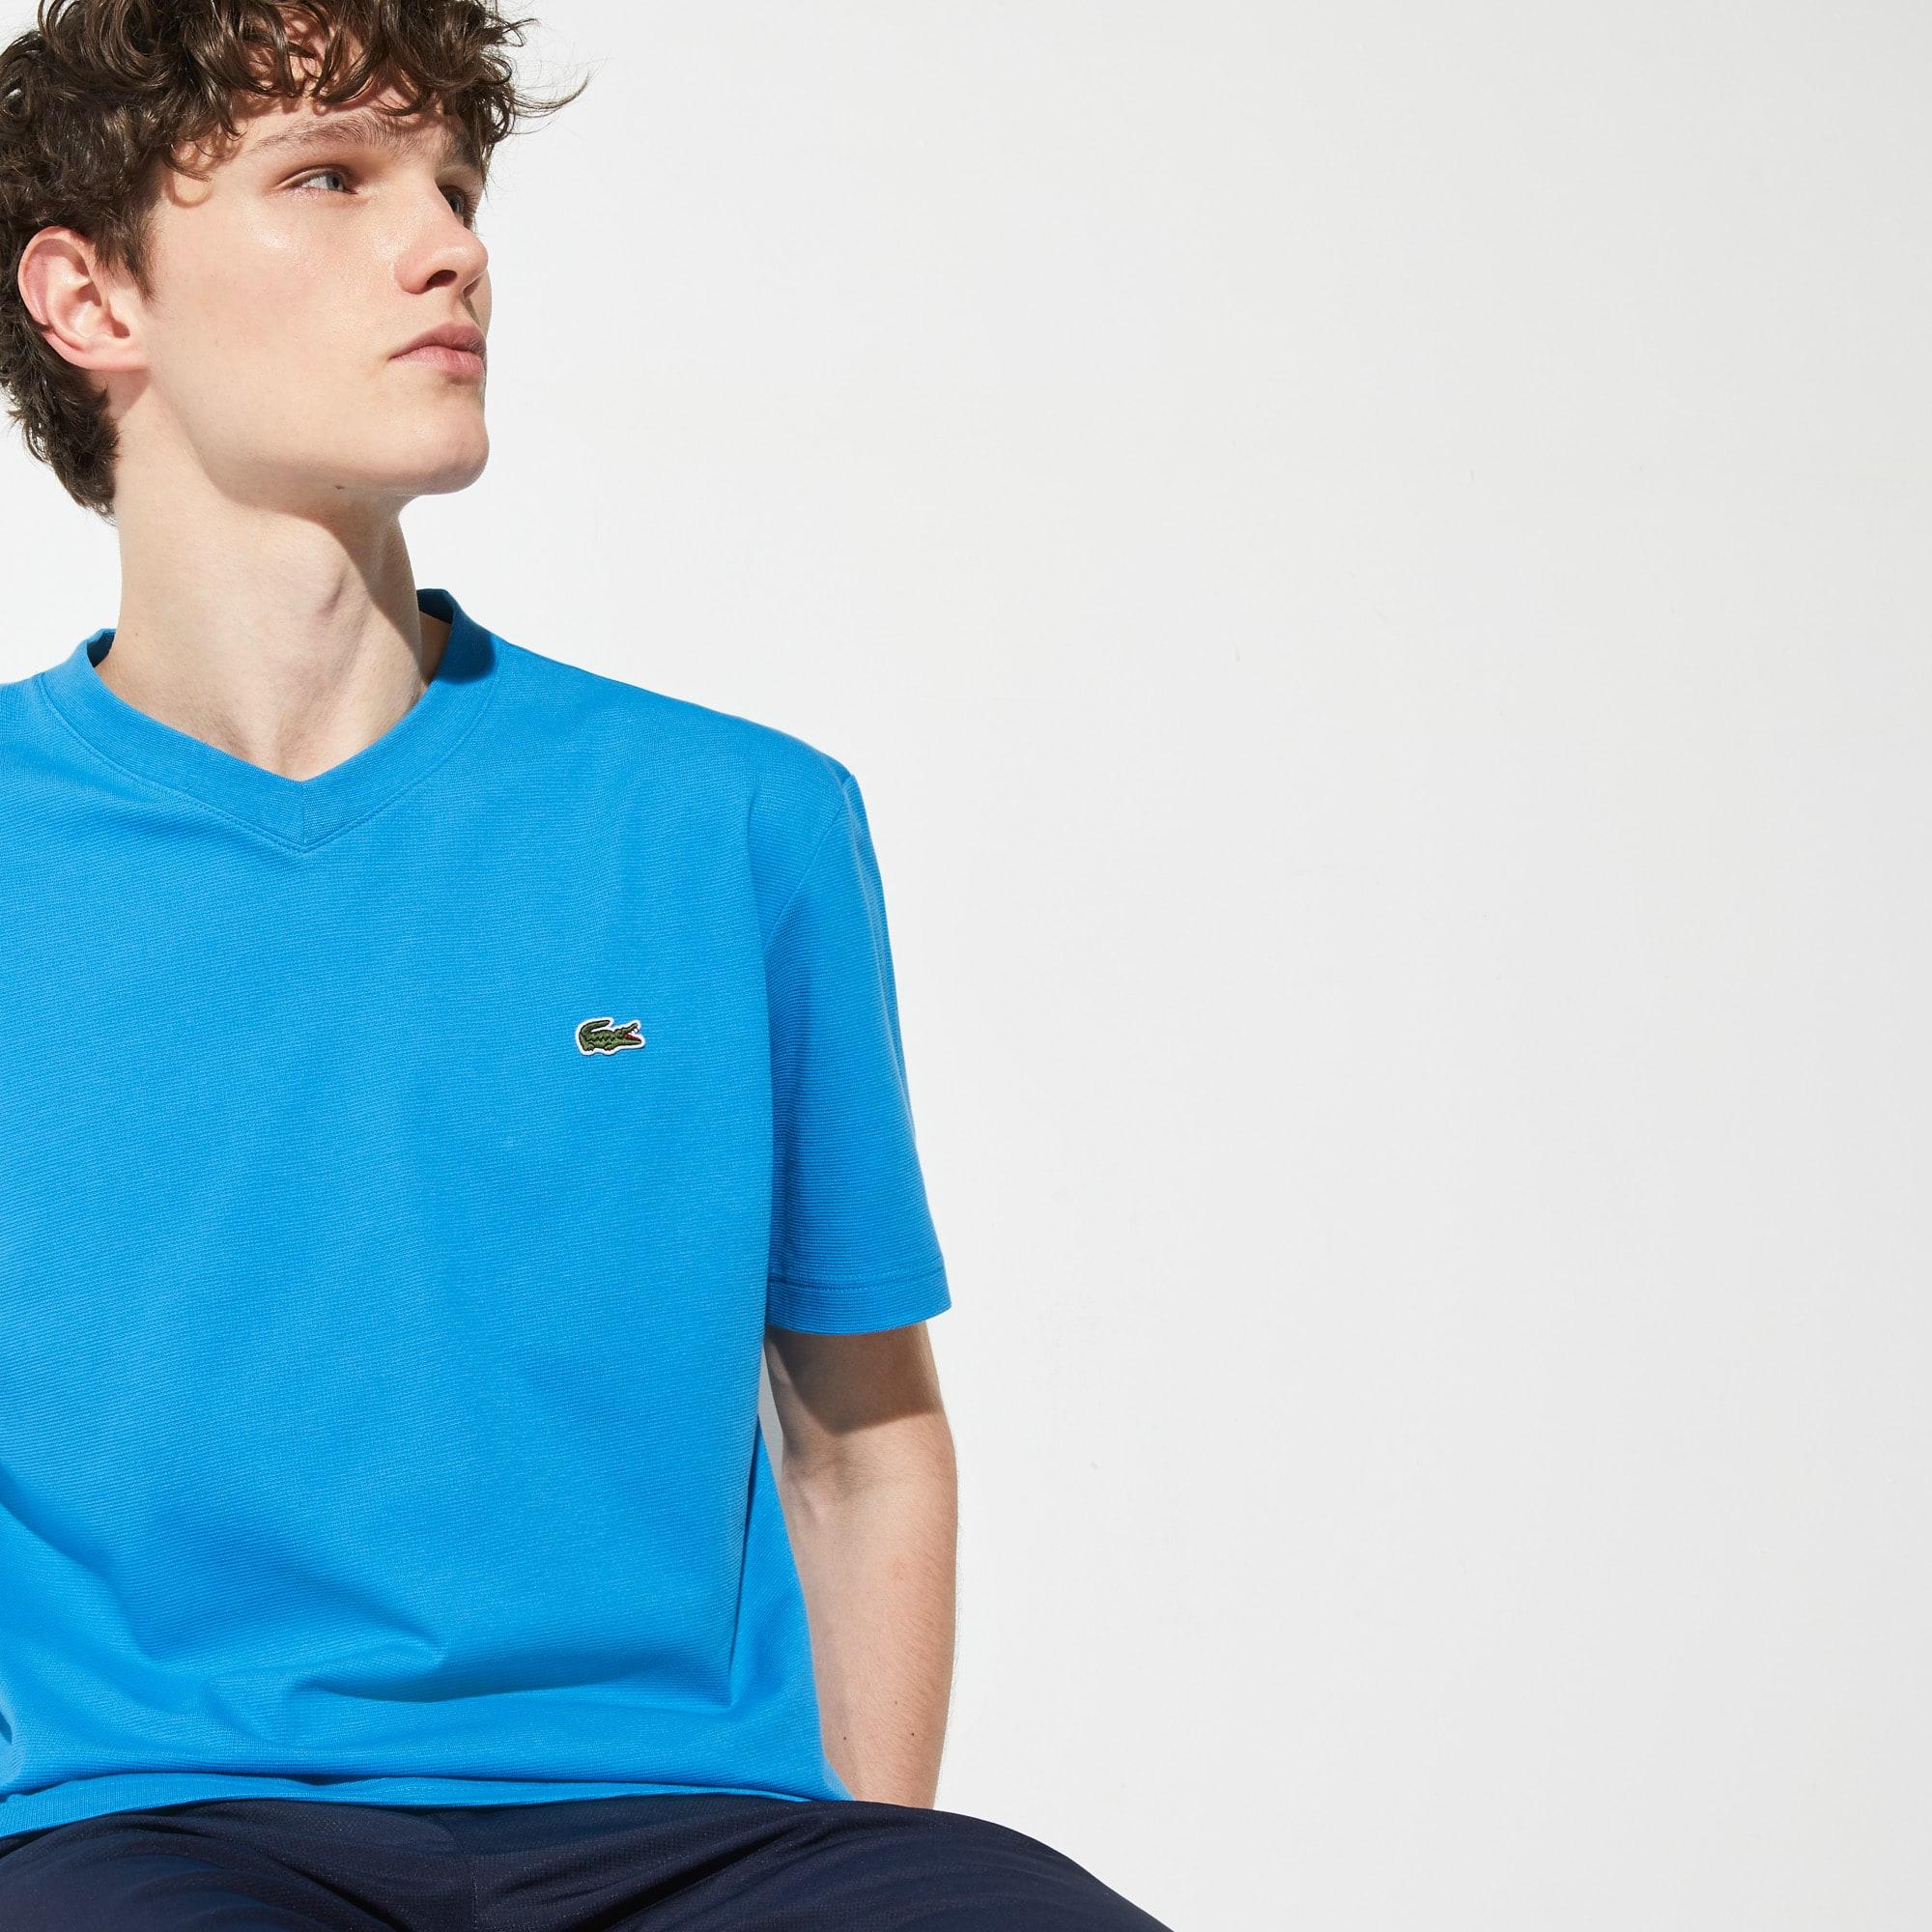 d02ab340d1f + 3 colors. Men s SPORT Ultra-Light Tennis T-Shirt